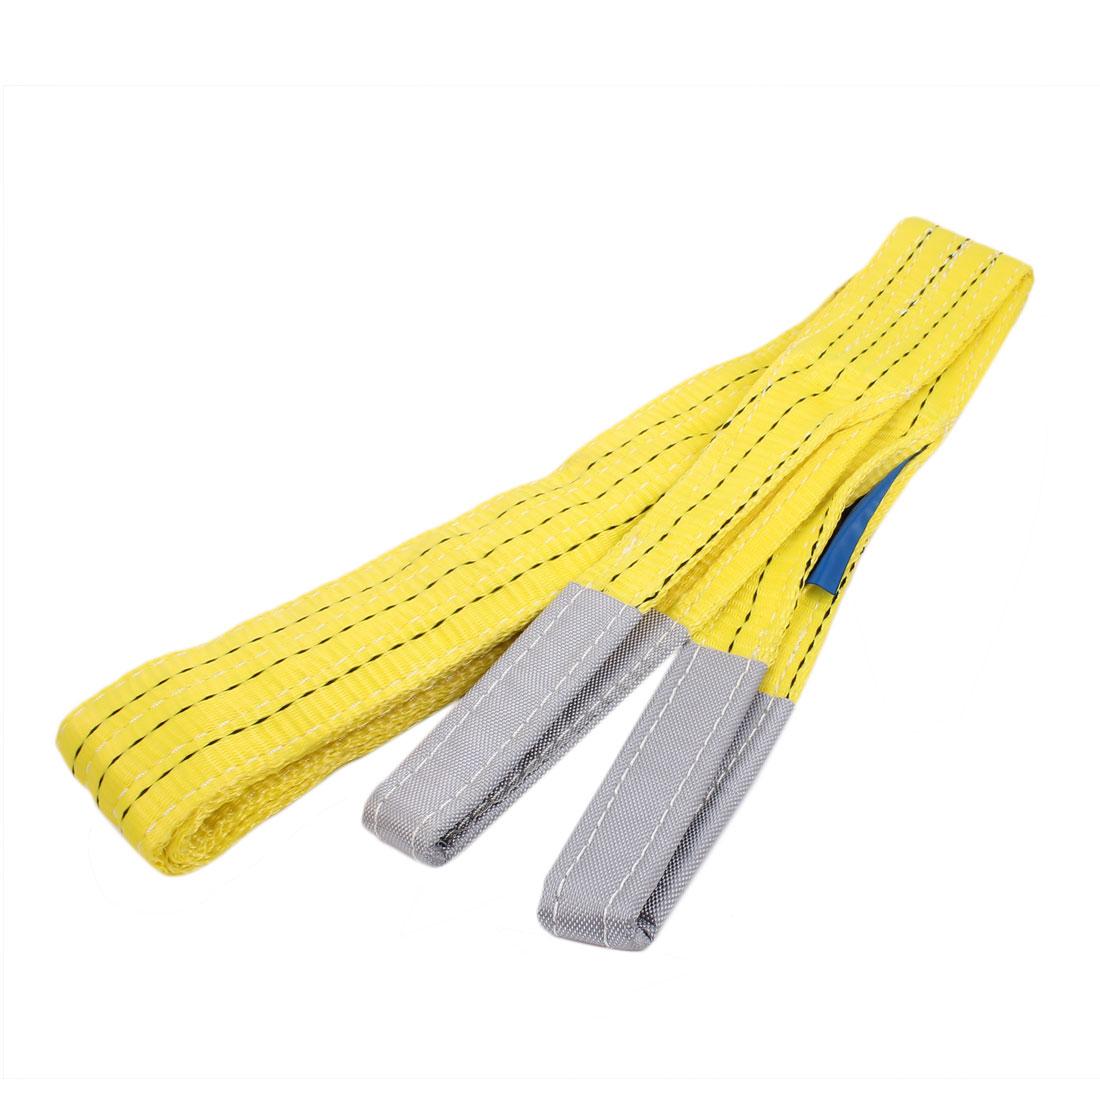 3 Meters Length 3T Straight Capacity Nylon Web Sling Lifting Tow Strap Yellow